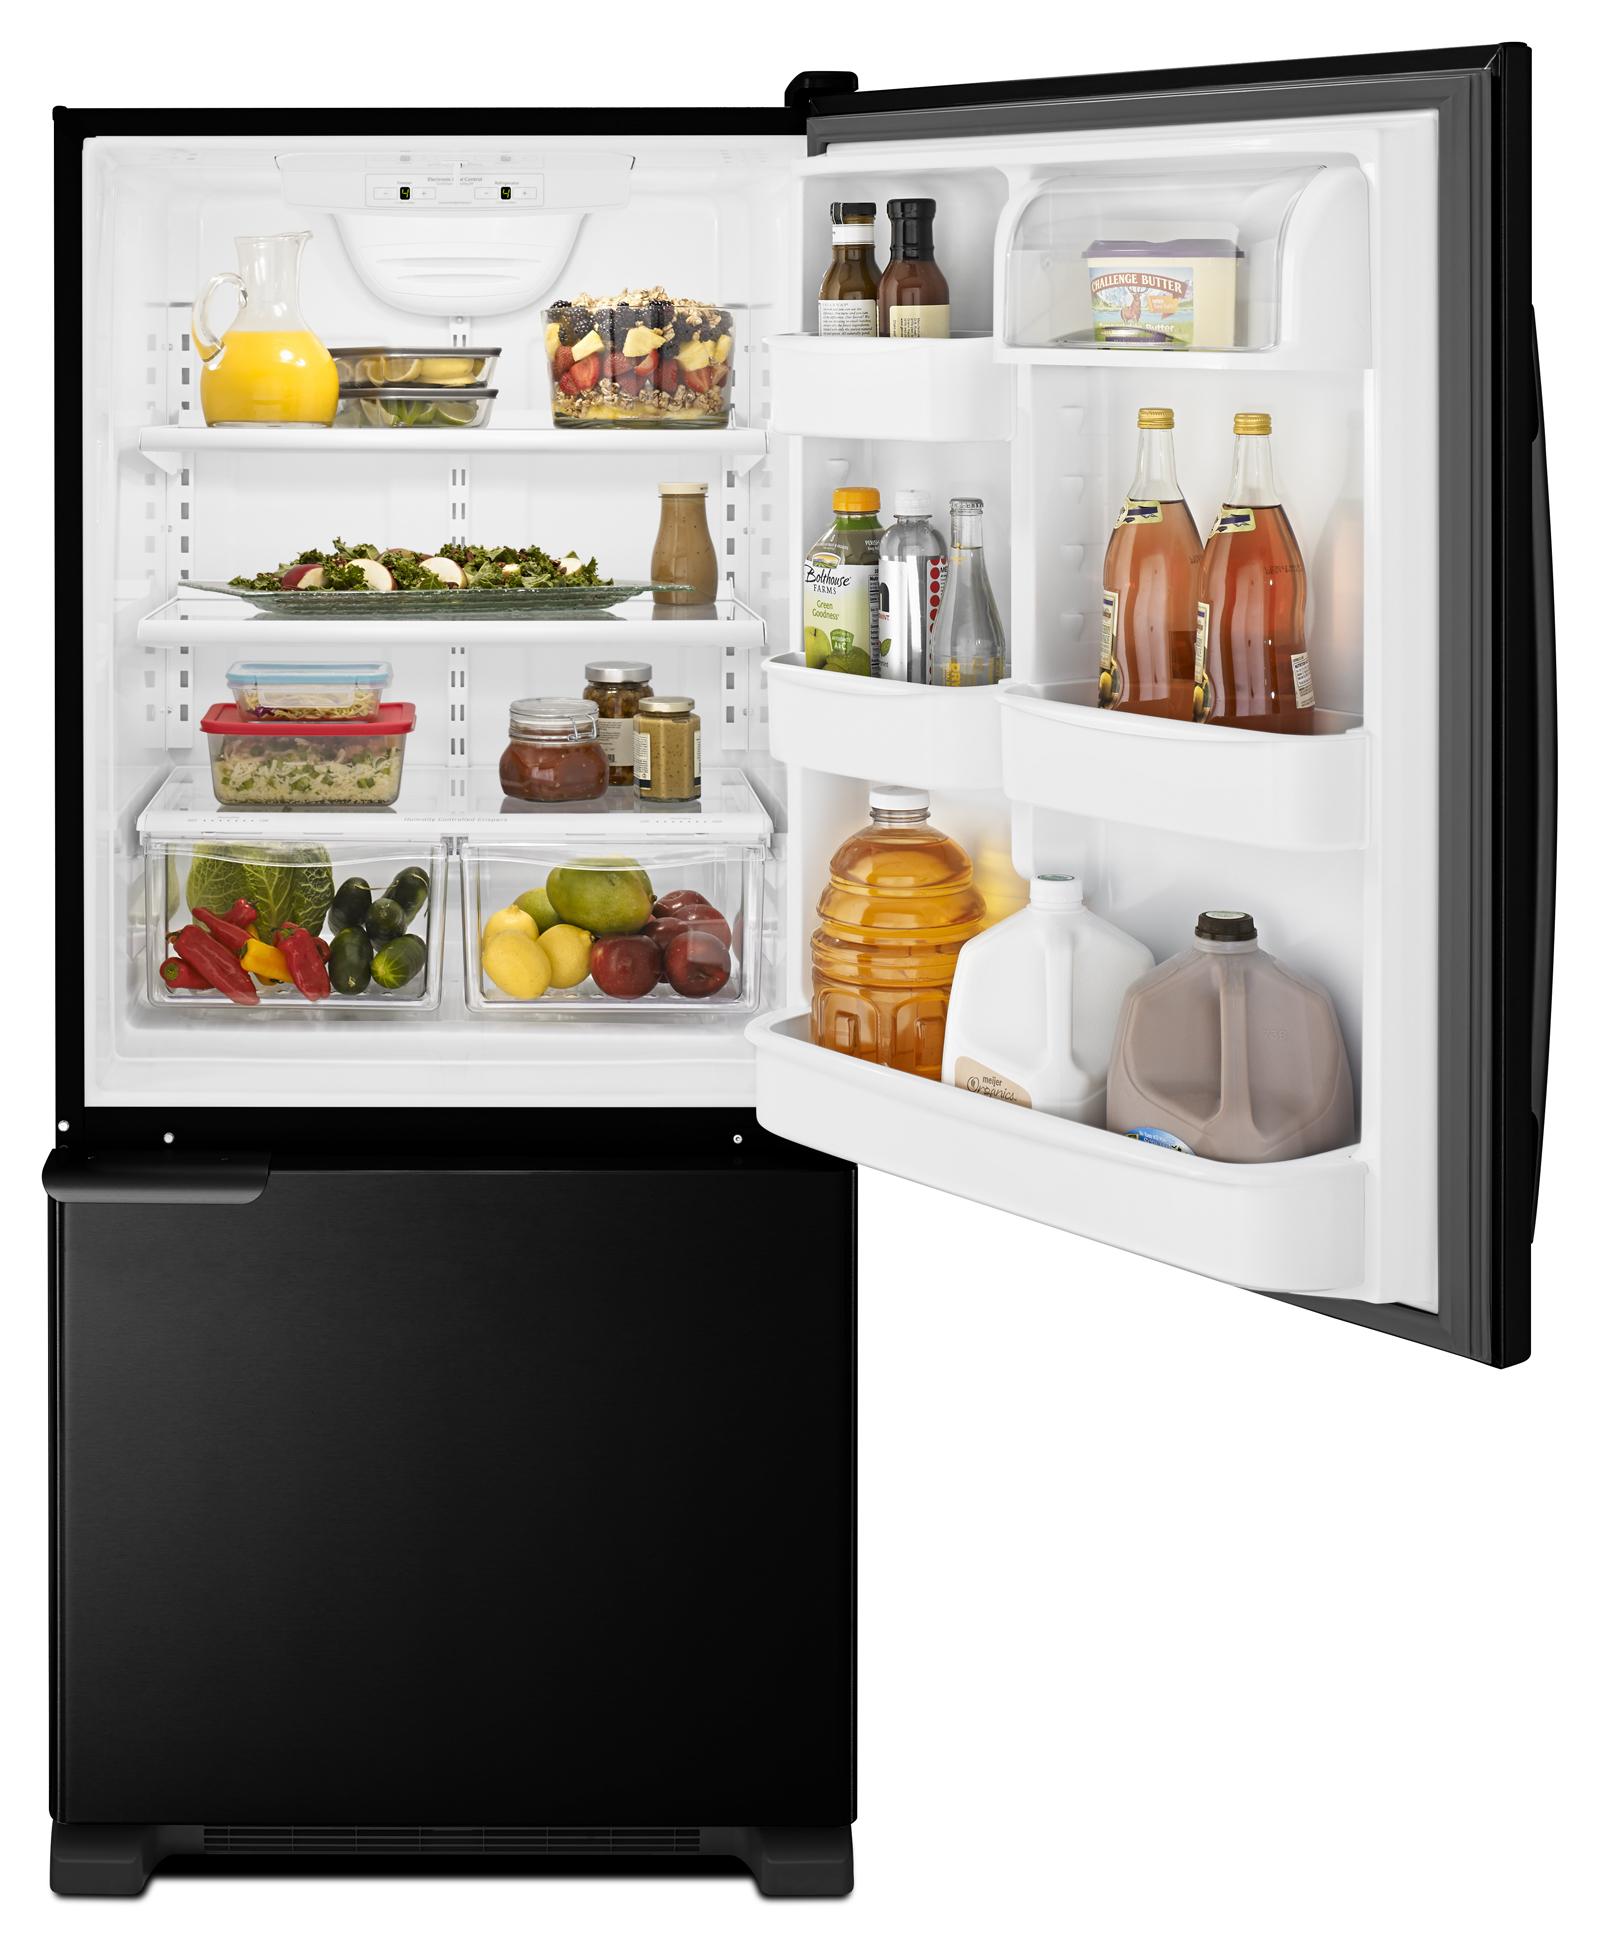 Amana 19 cu. ft. Single-Door Bottom Freezer Refrigerator - Black ABB1921BRB